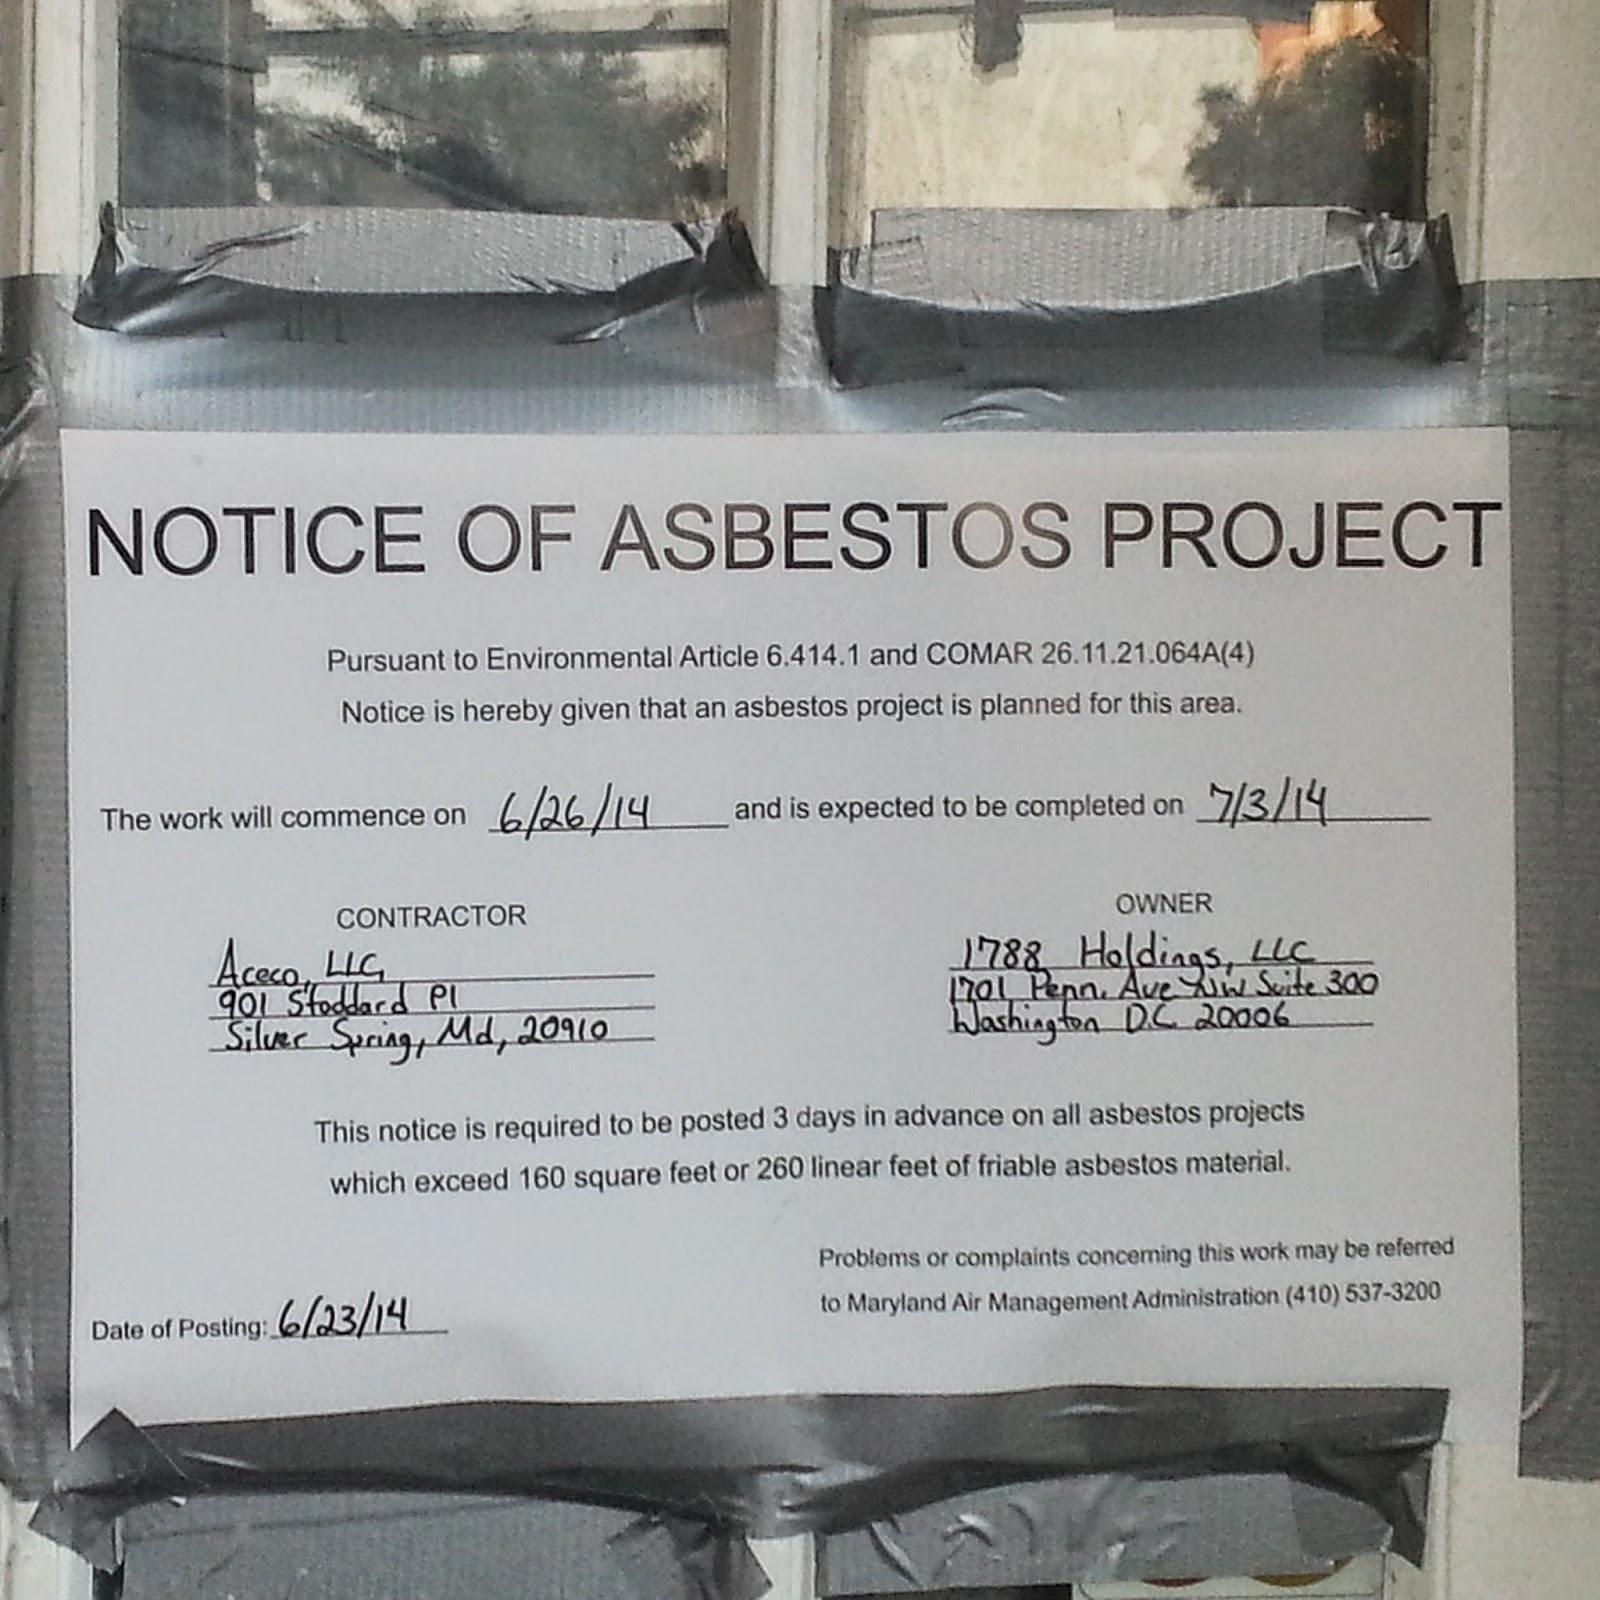 Robert Dyer @ Bethesda Row: ASBESTOS PROJECT NOW PART OF BETHESDA ...